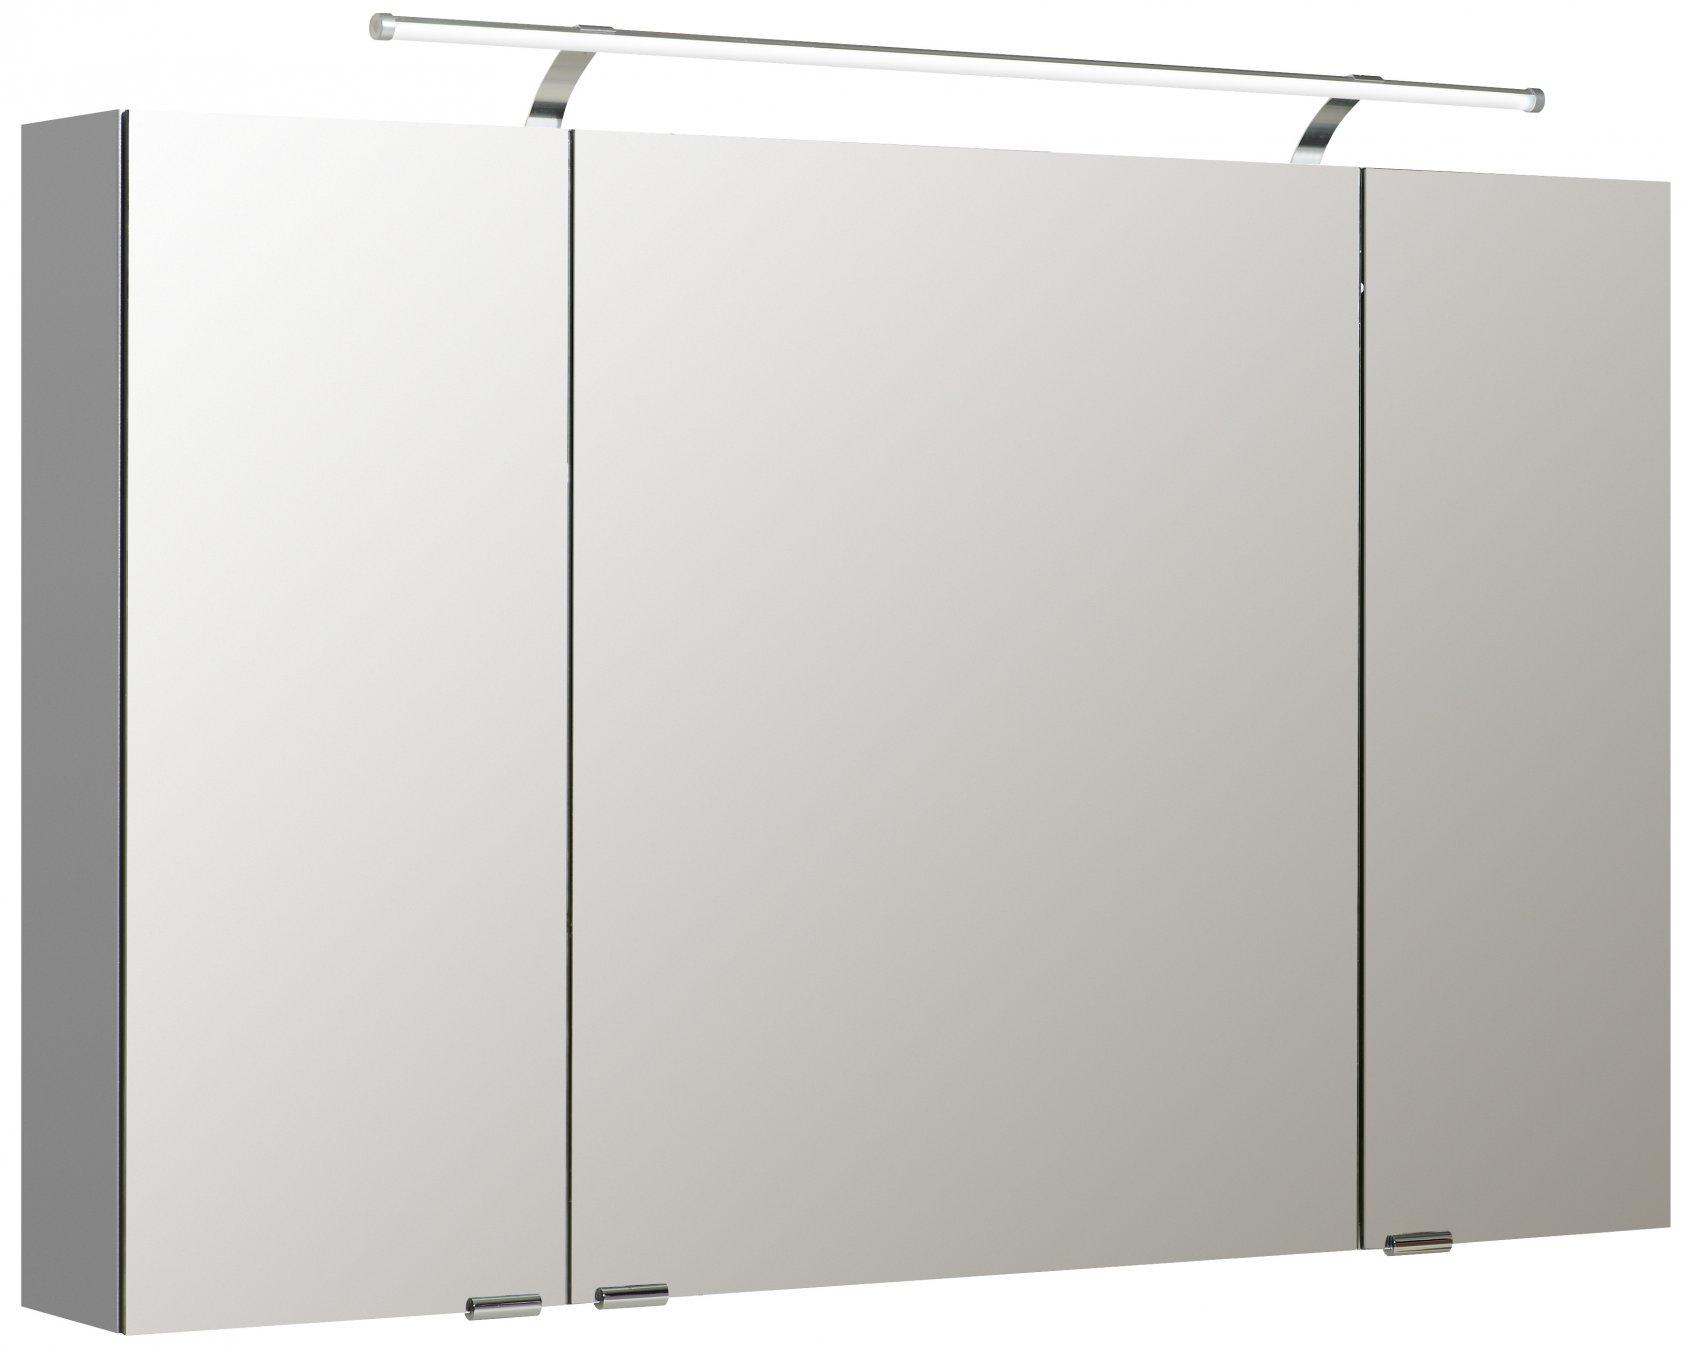 pelipal neutraler spiegelschrank s5 s5 spsd 18 arcom center. Black Bedroom Furniture Sets. Home Design Ideas